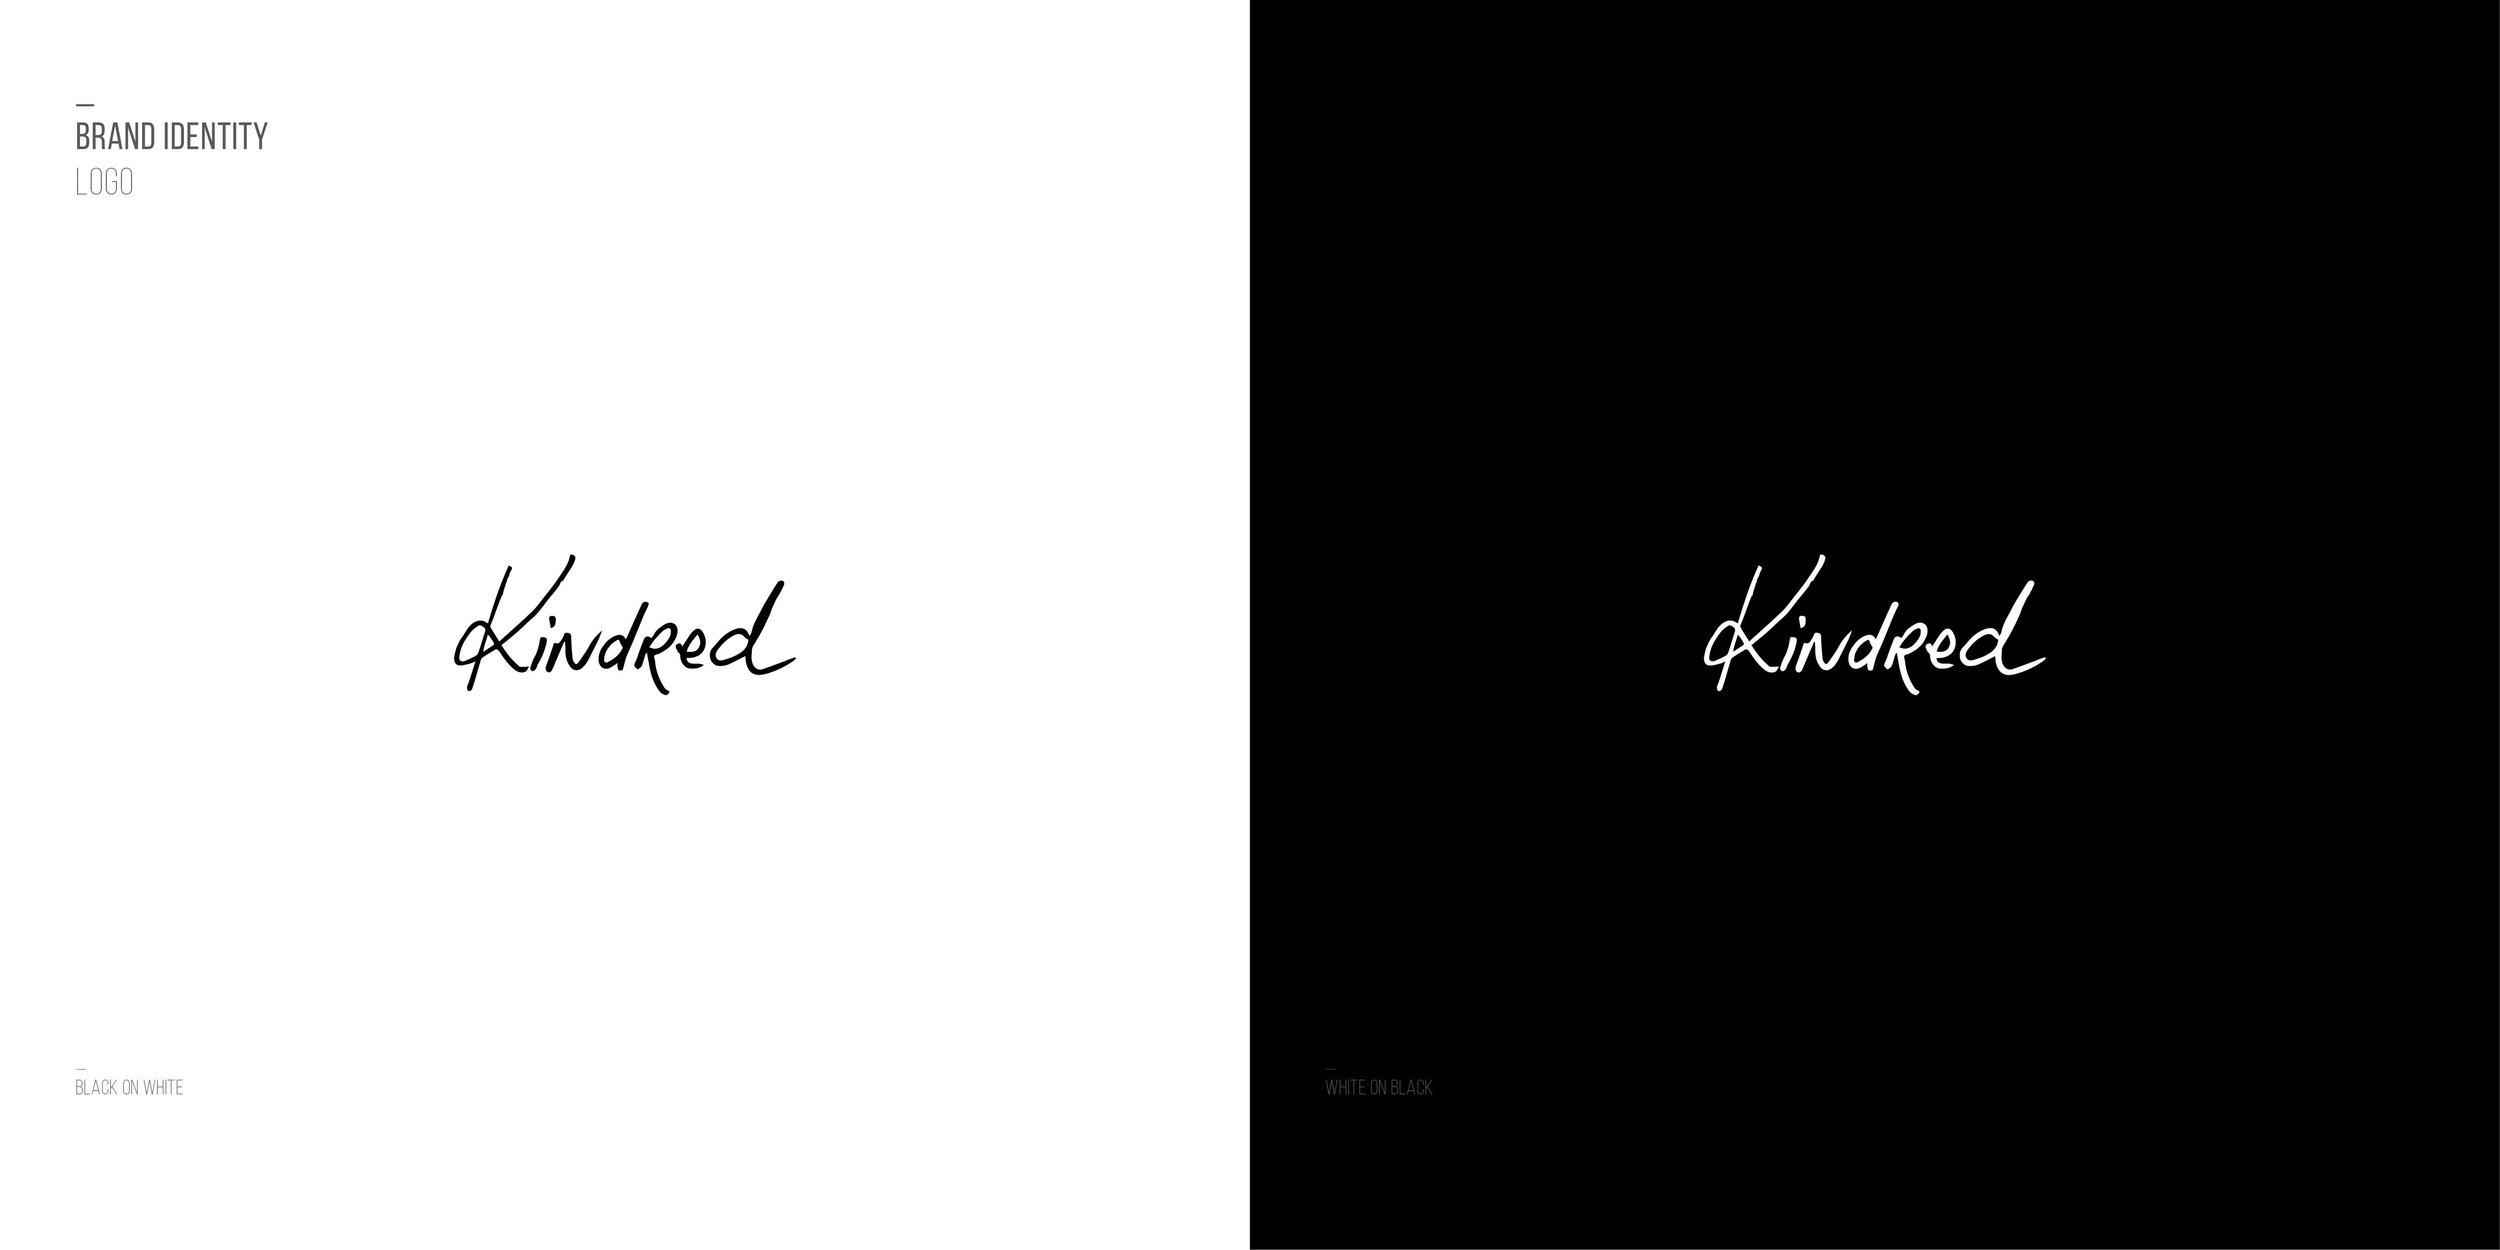 Kindred_Brand_Identity2.jpg